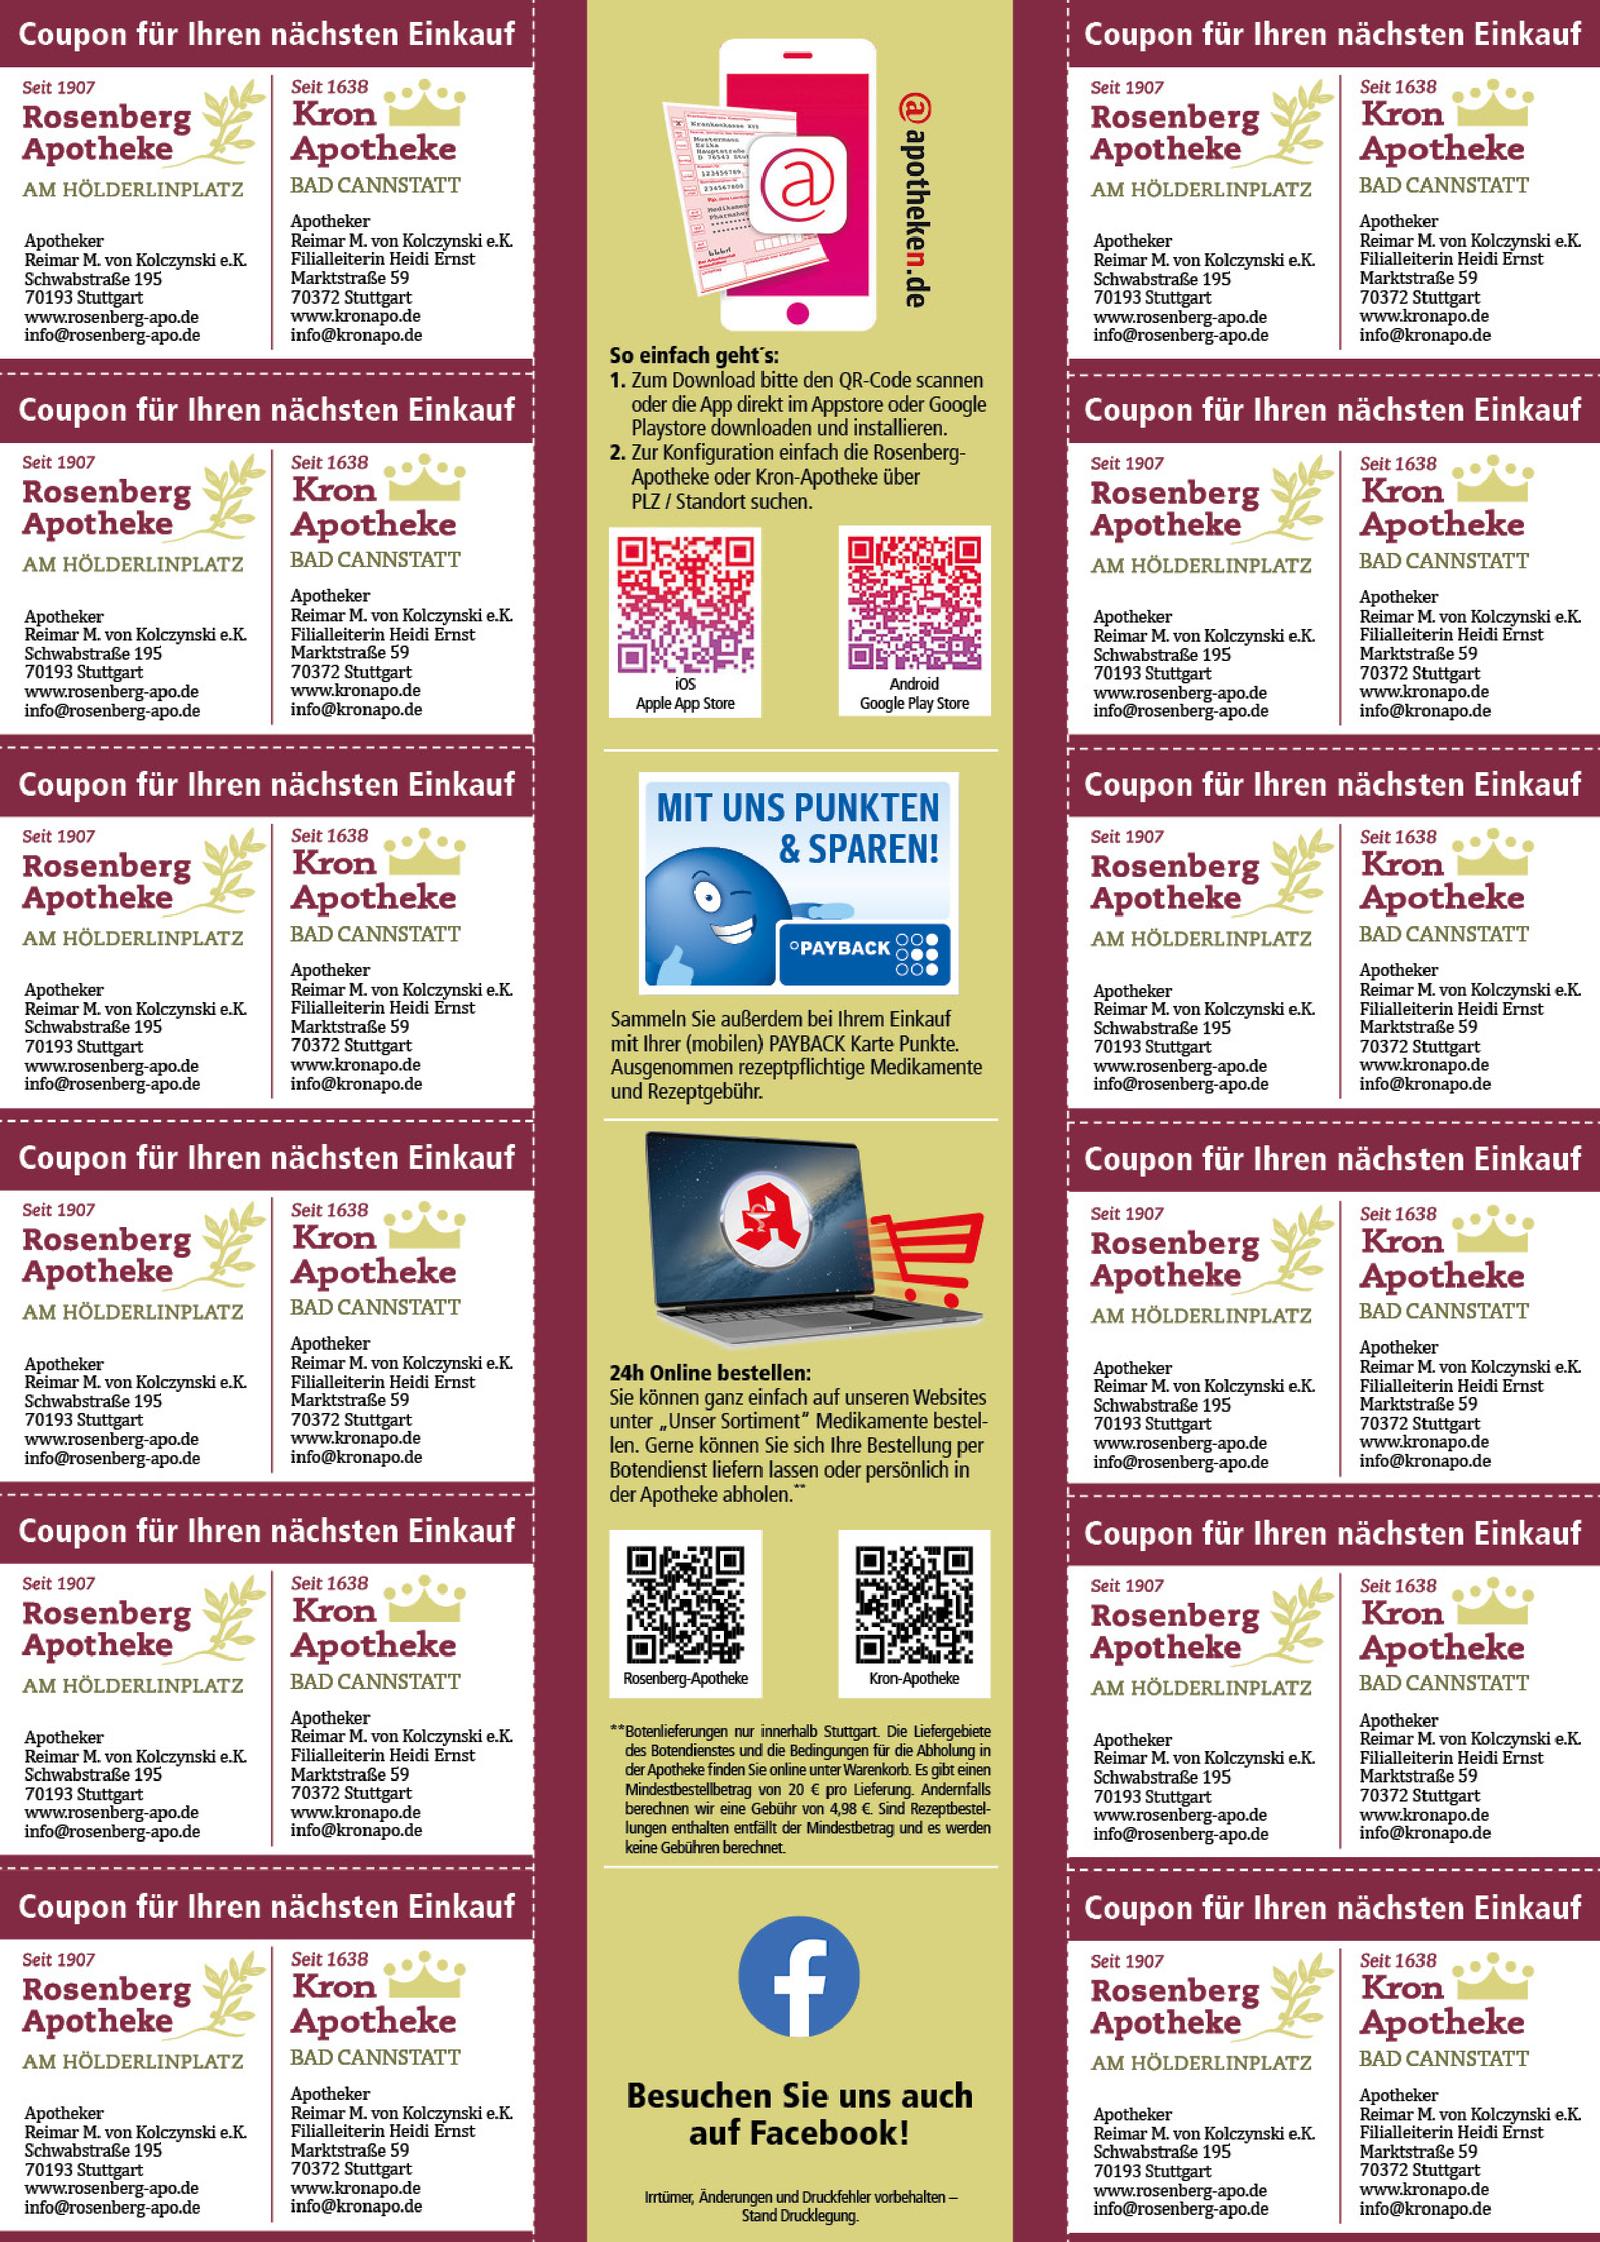 https://mein-uploads.apocdn.net/5268/leaflets/5268_flyer-Seite2.png